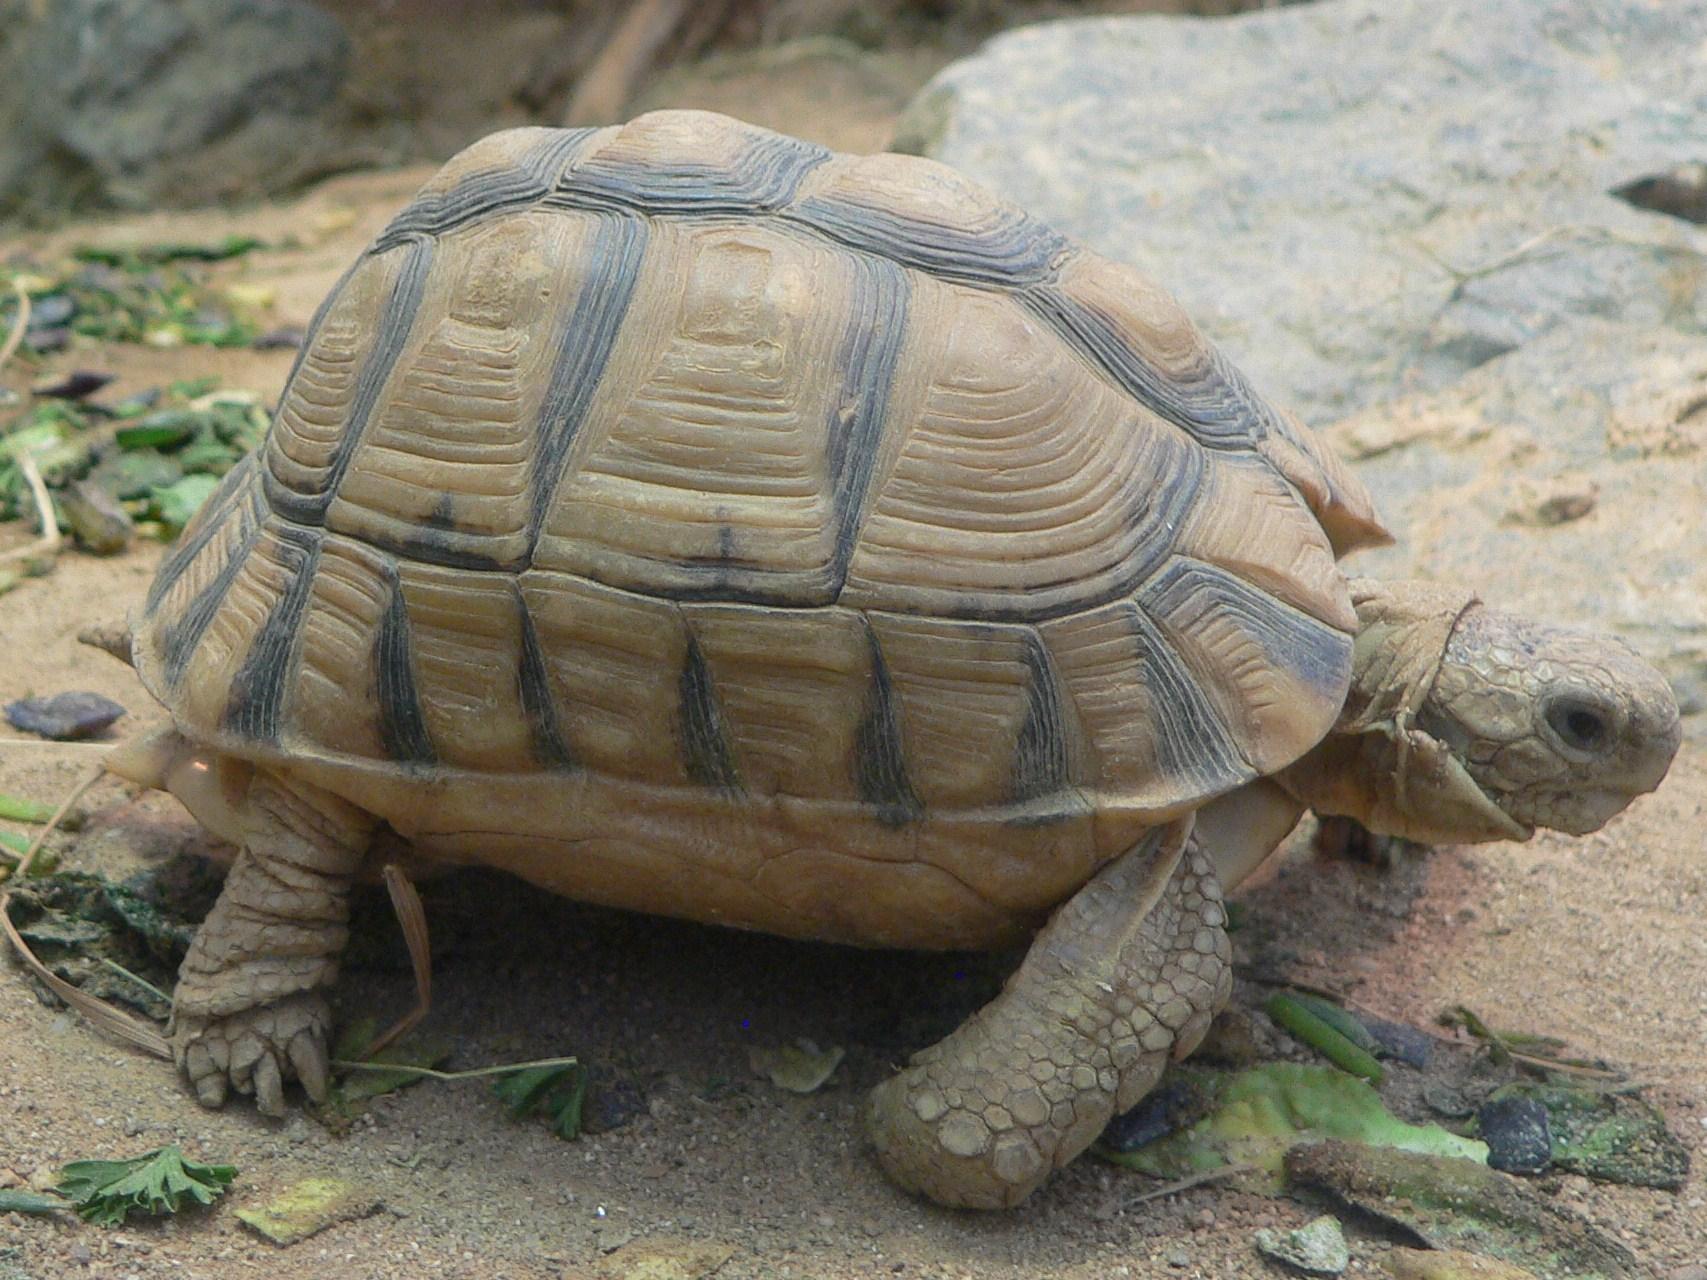 معلومات عامه عن السلحفاه tortoise TEstudo_kleinmanni_2008-11-02_246